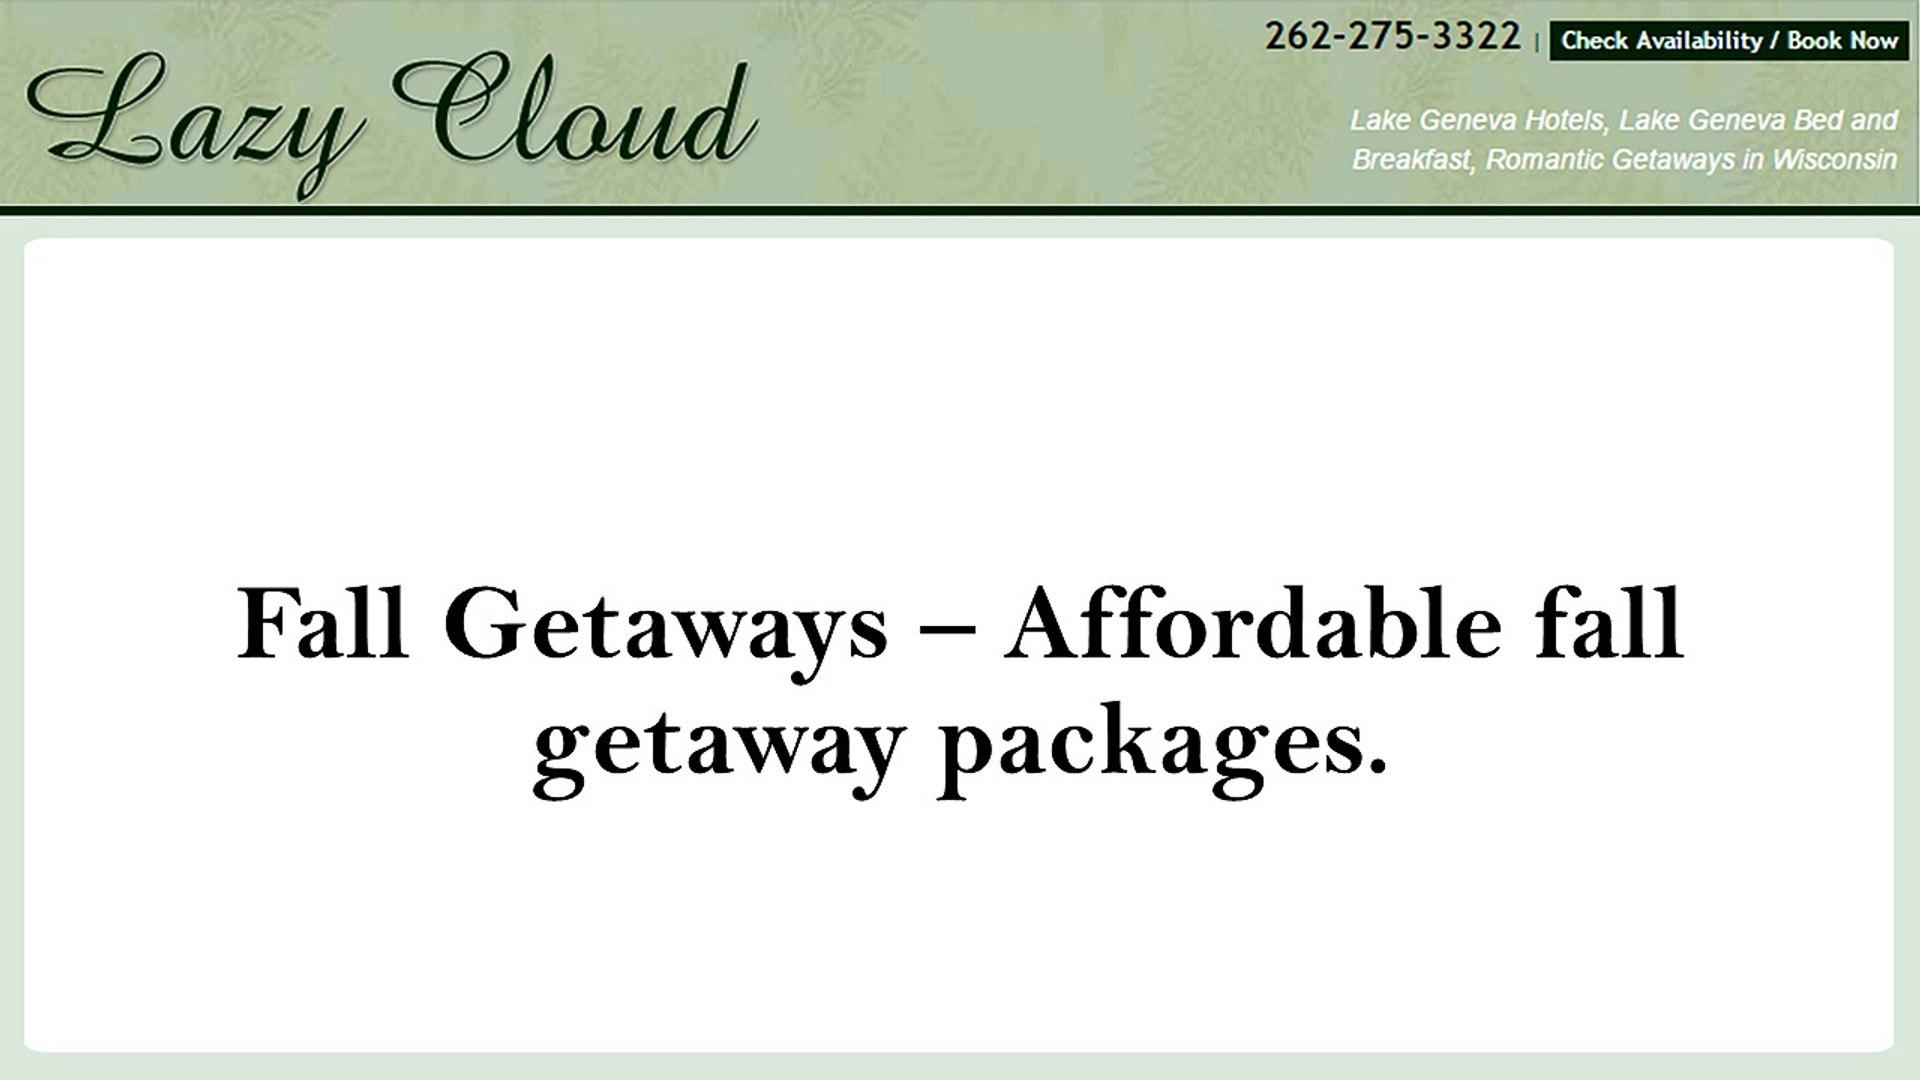 Fall Getaways – Affordable fall getaway packages.